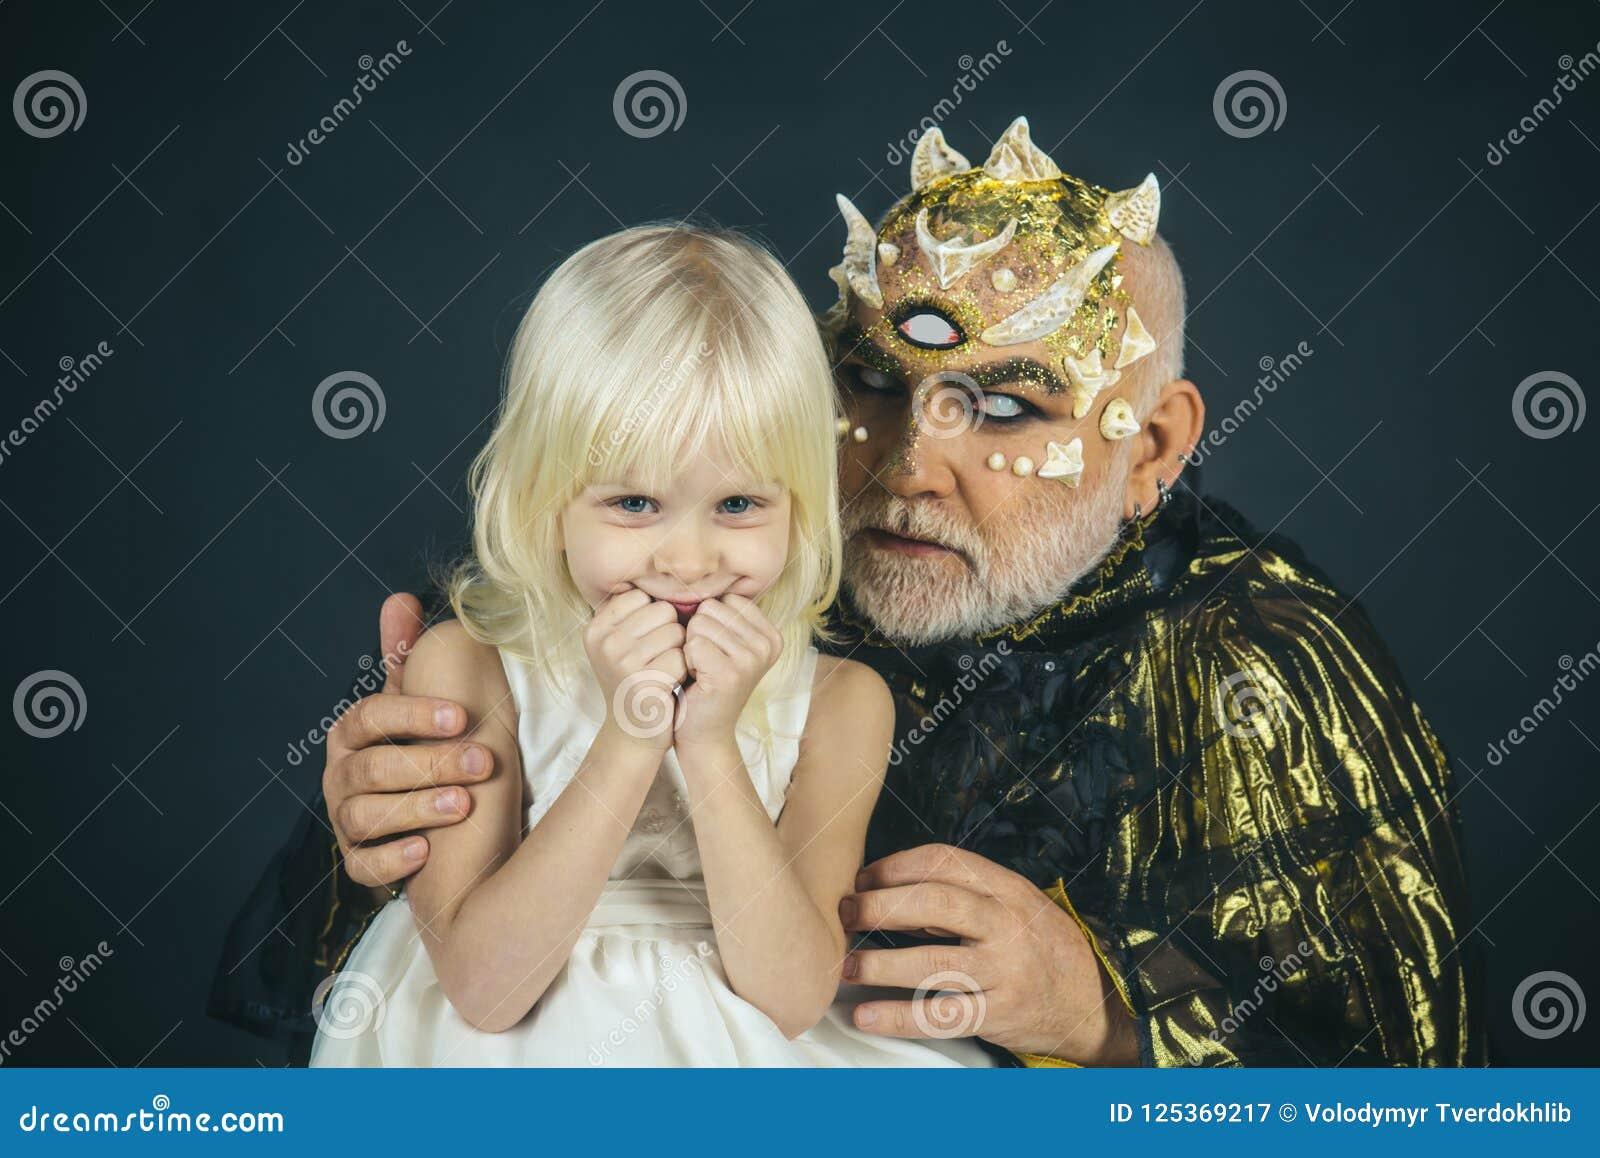 Enchantment σε αποκριές enchantment μυστηρίου του τέρατος αποκριών και του ευτυχούς μικρού κοριτσιού μικρό κορίτσι που χαμογελά κ